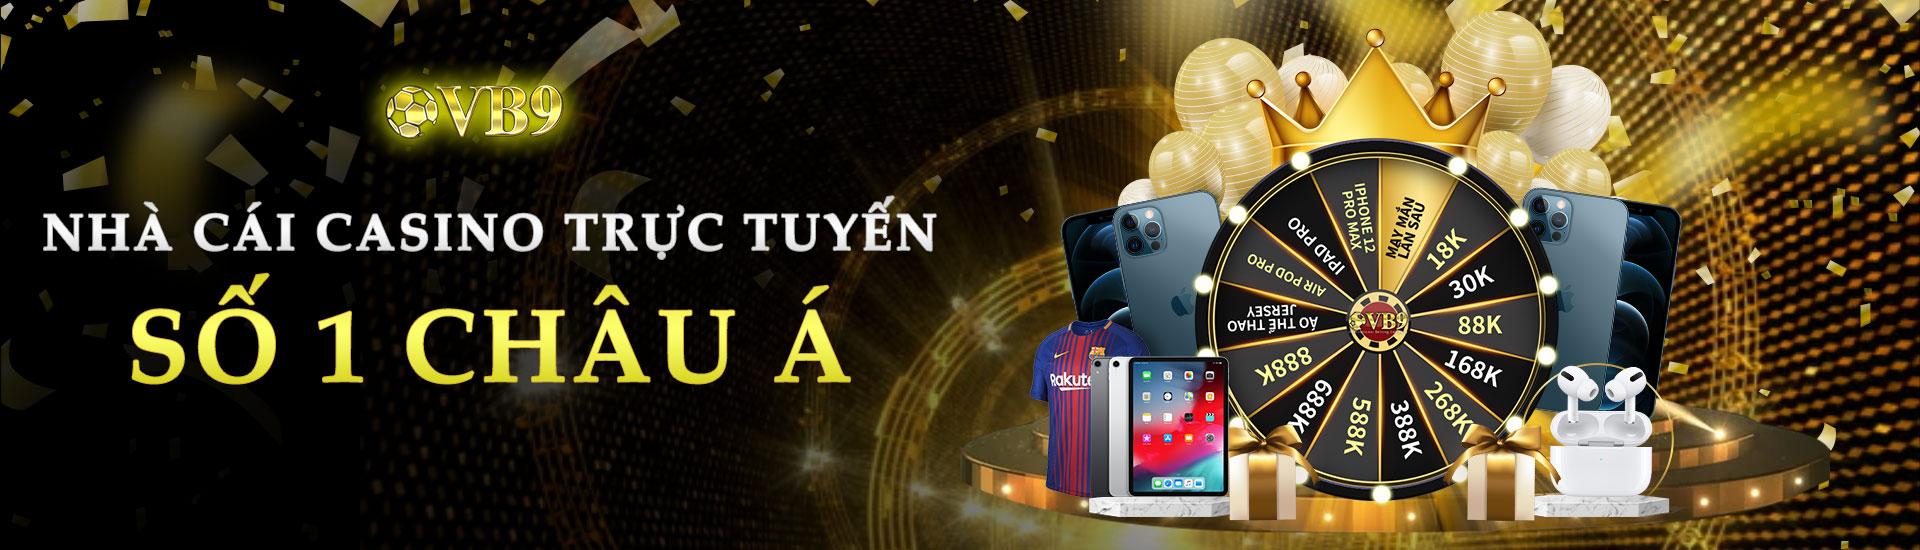 vuabai9, casino trực tuyến, online casino, casino online, vb9,